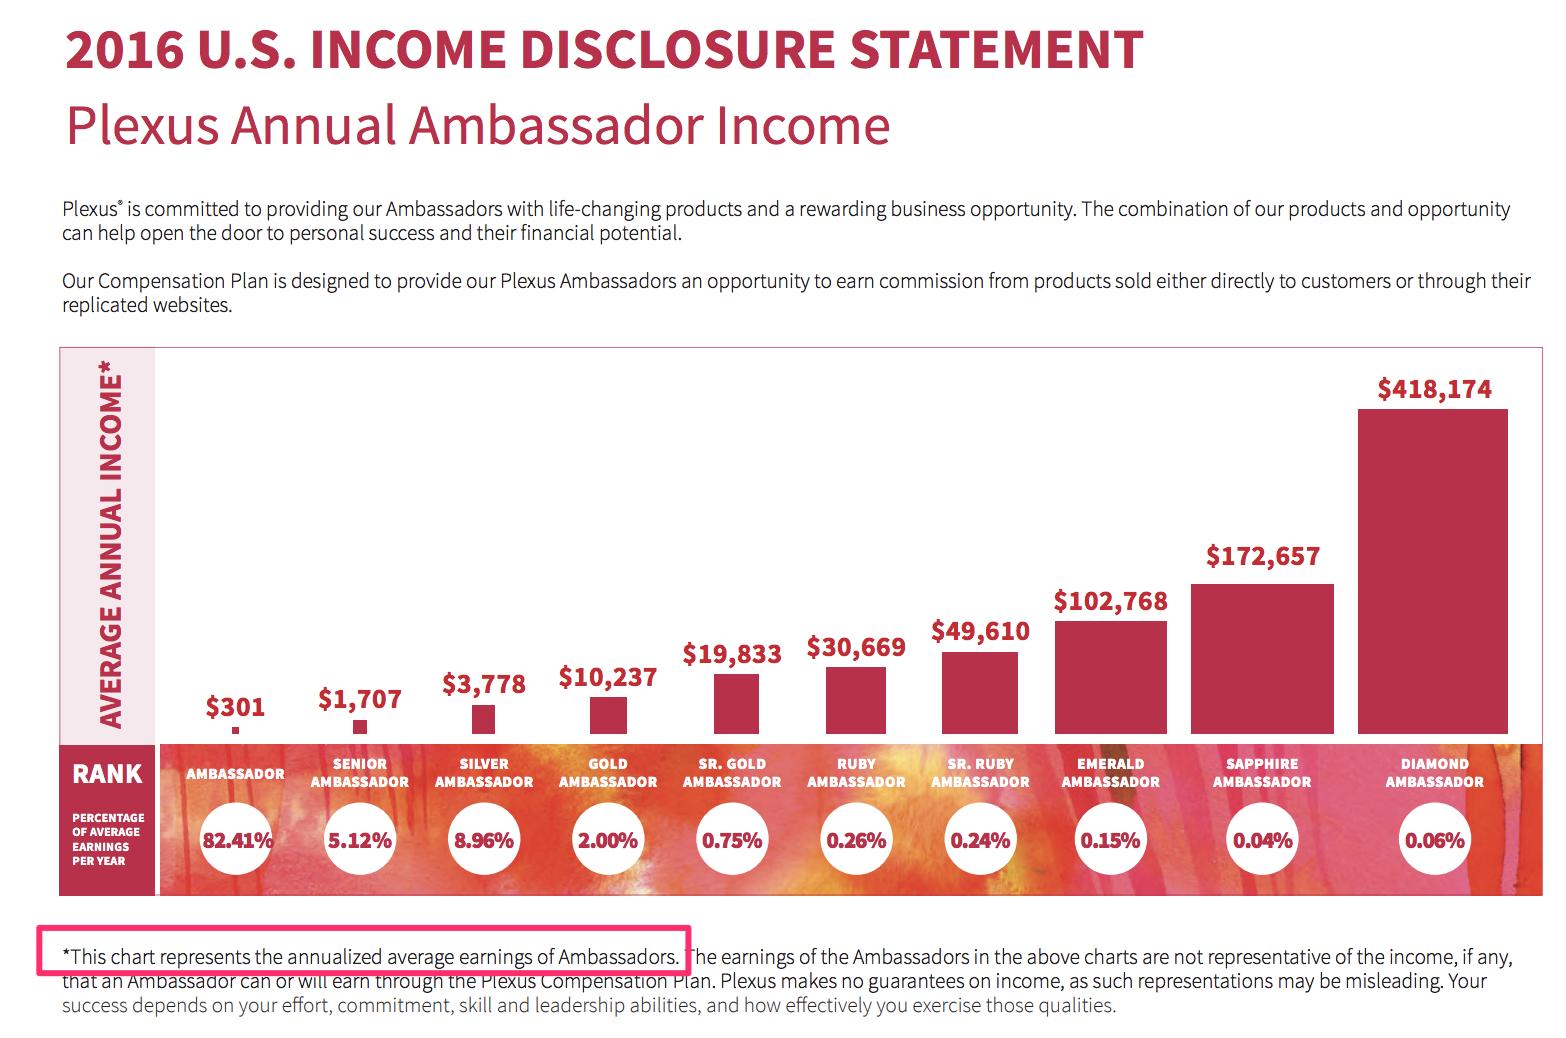 Plexus Income Disclosure from 2016